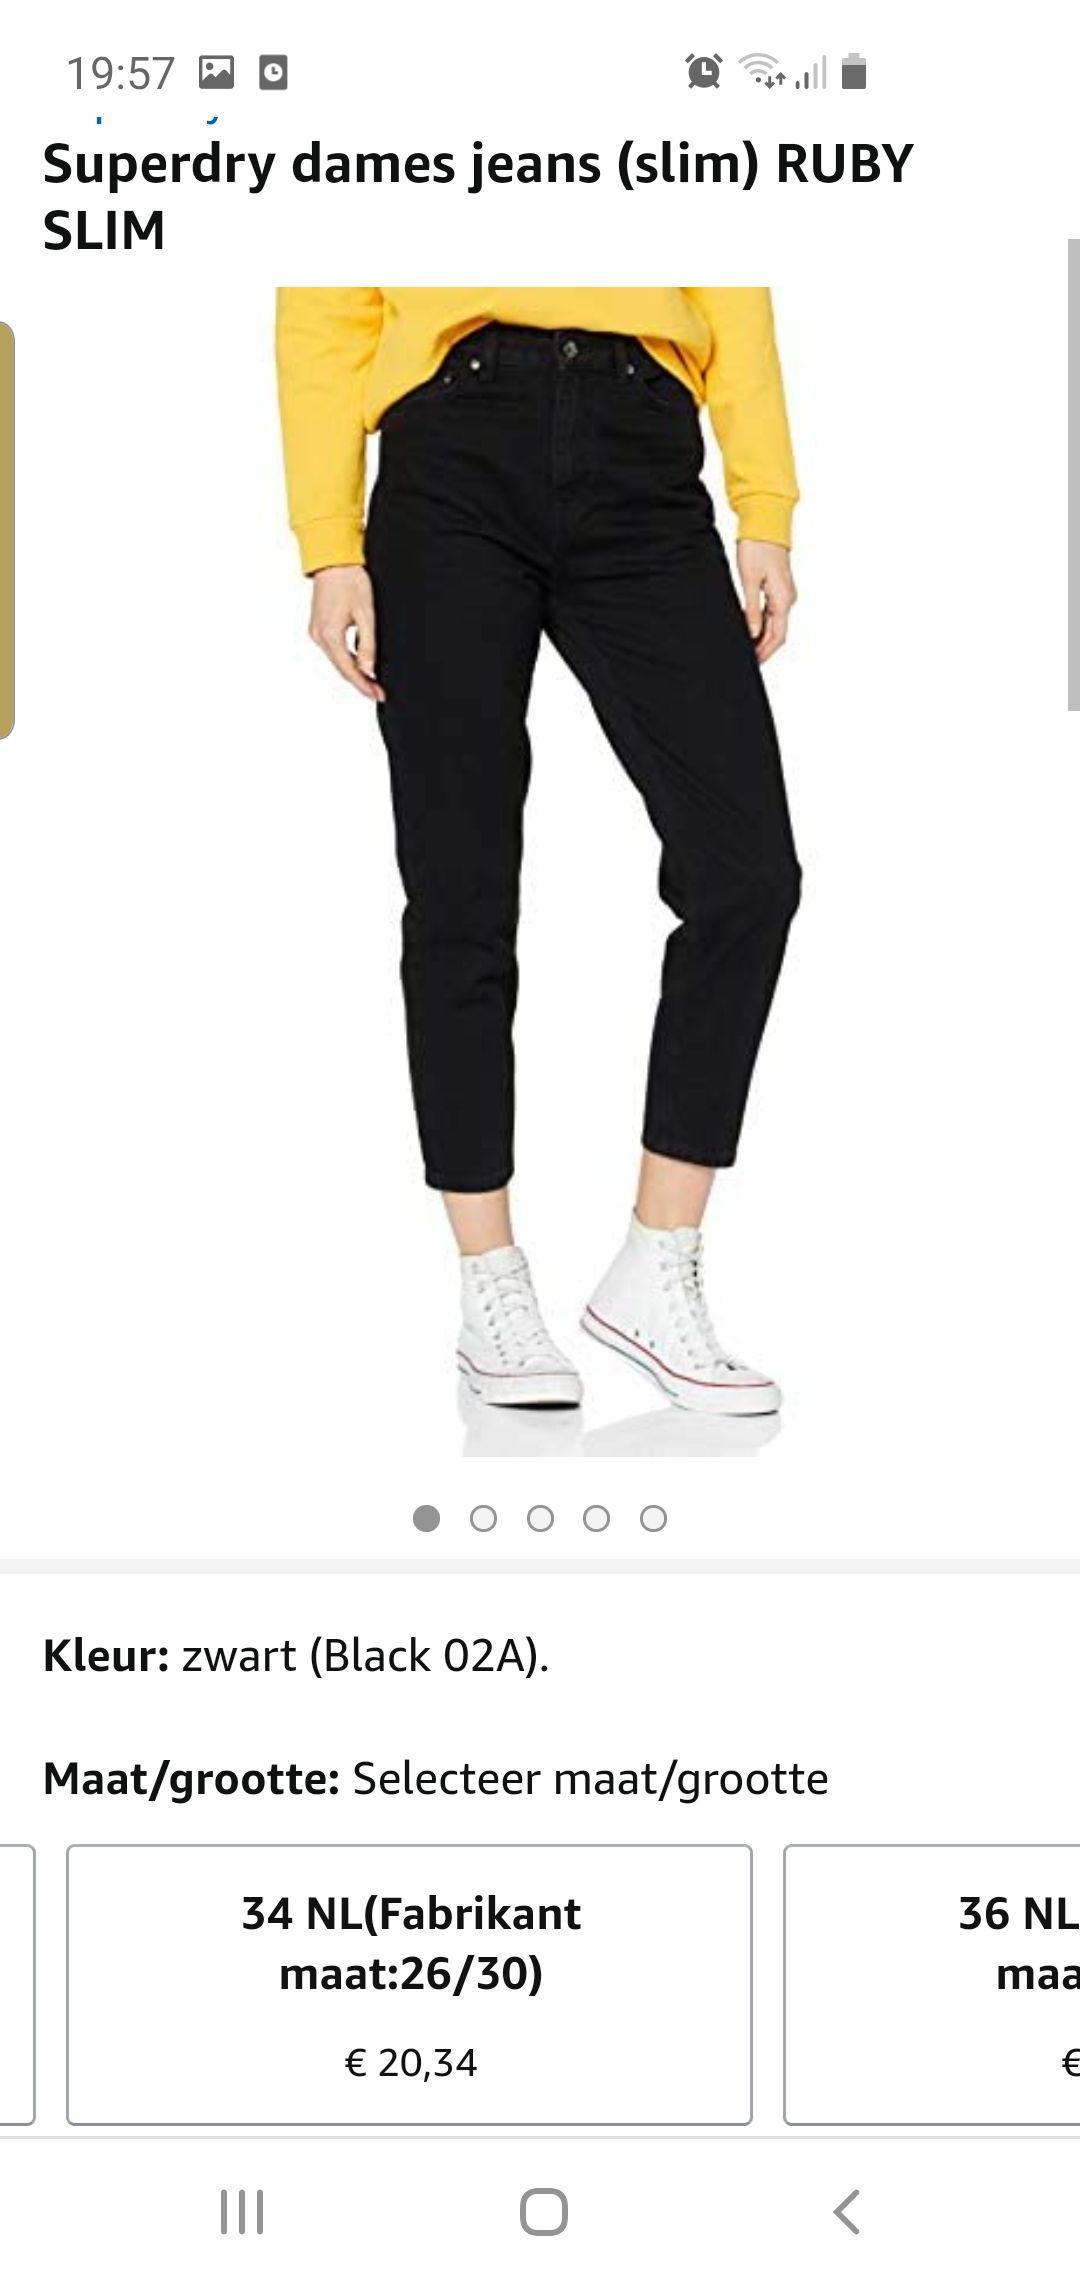 Superdry dames jeans